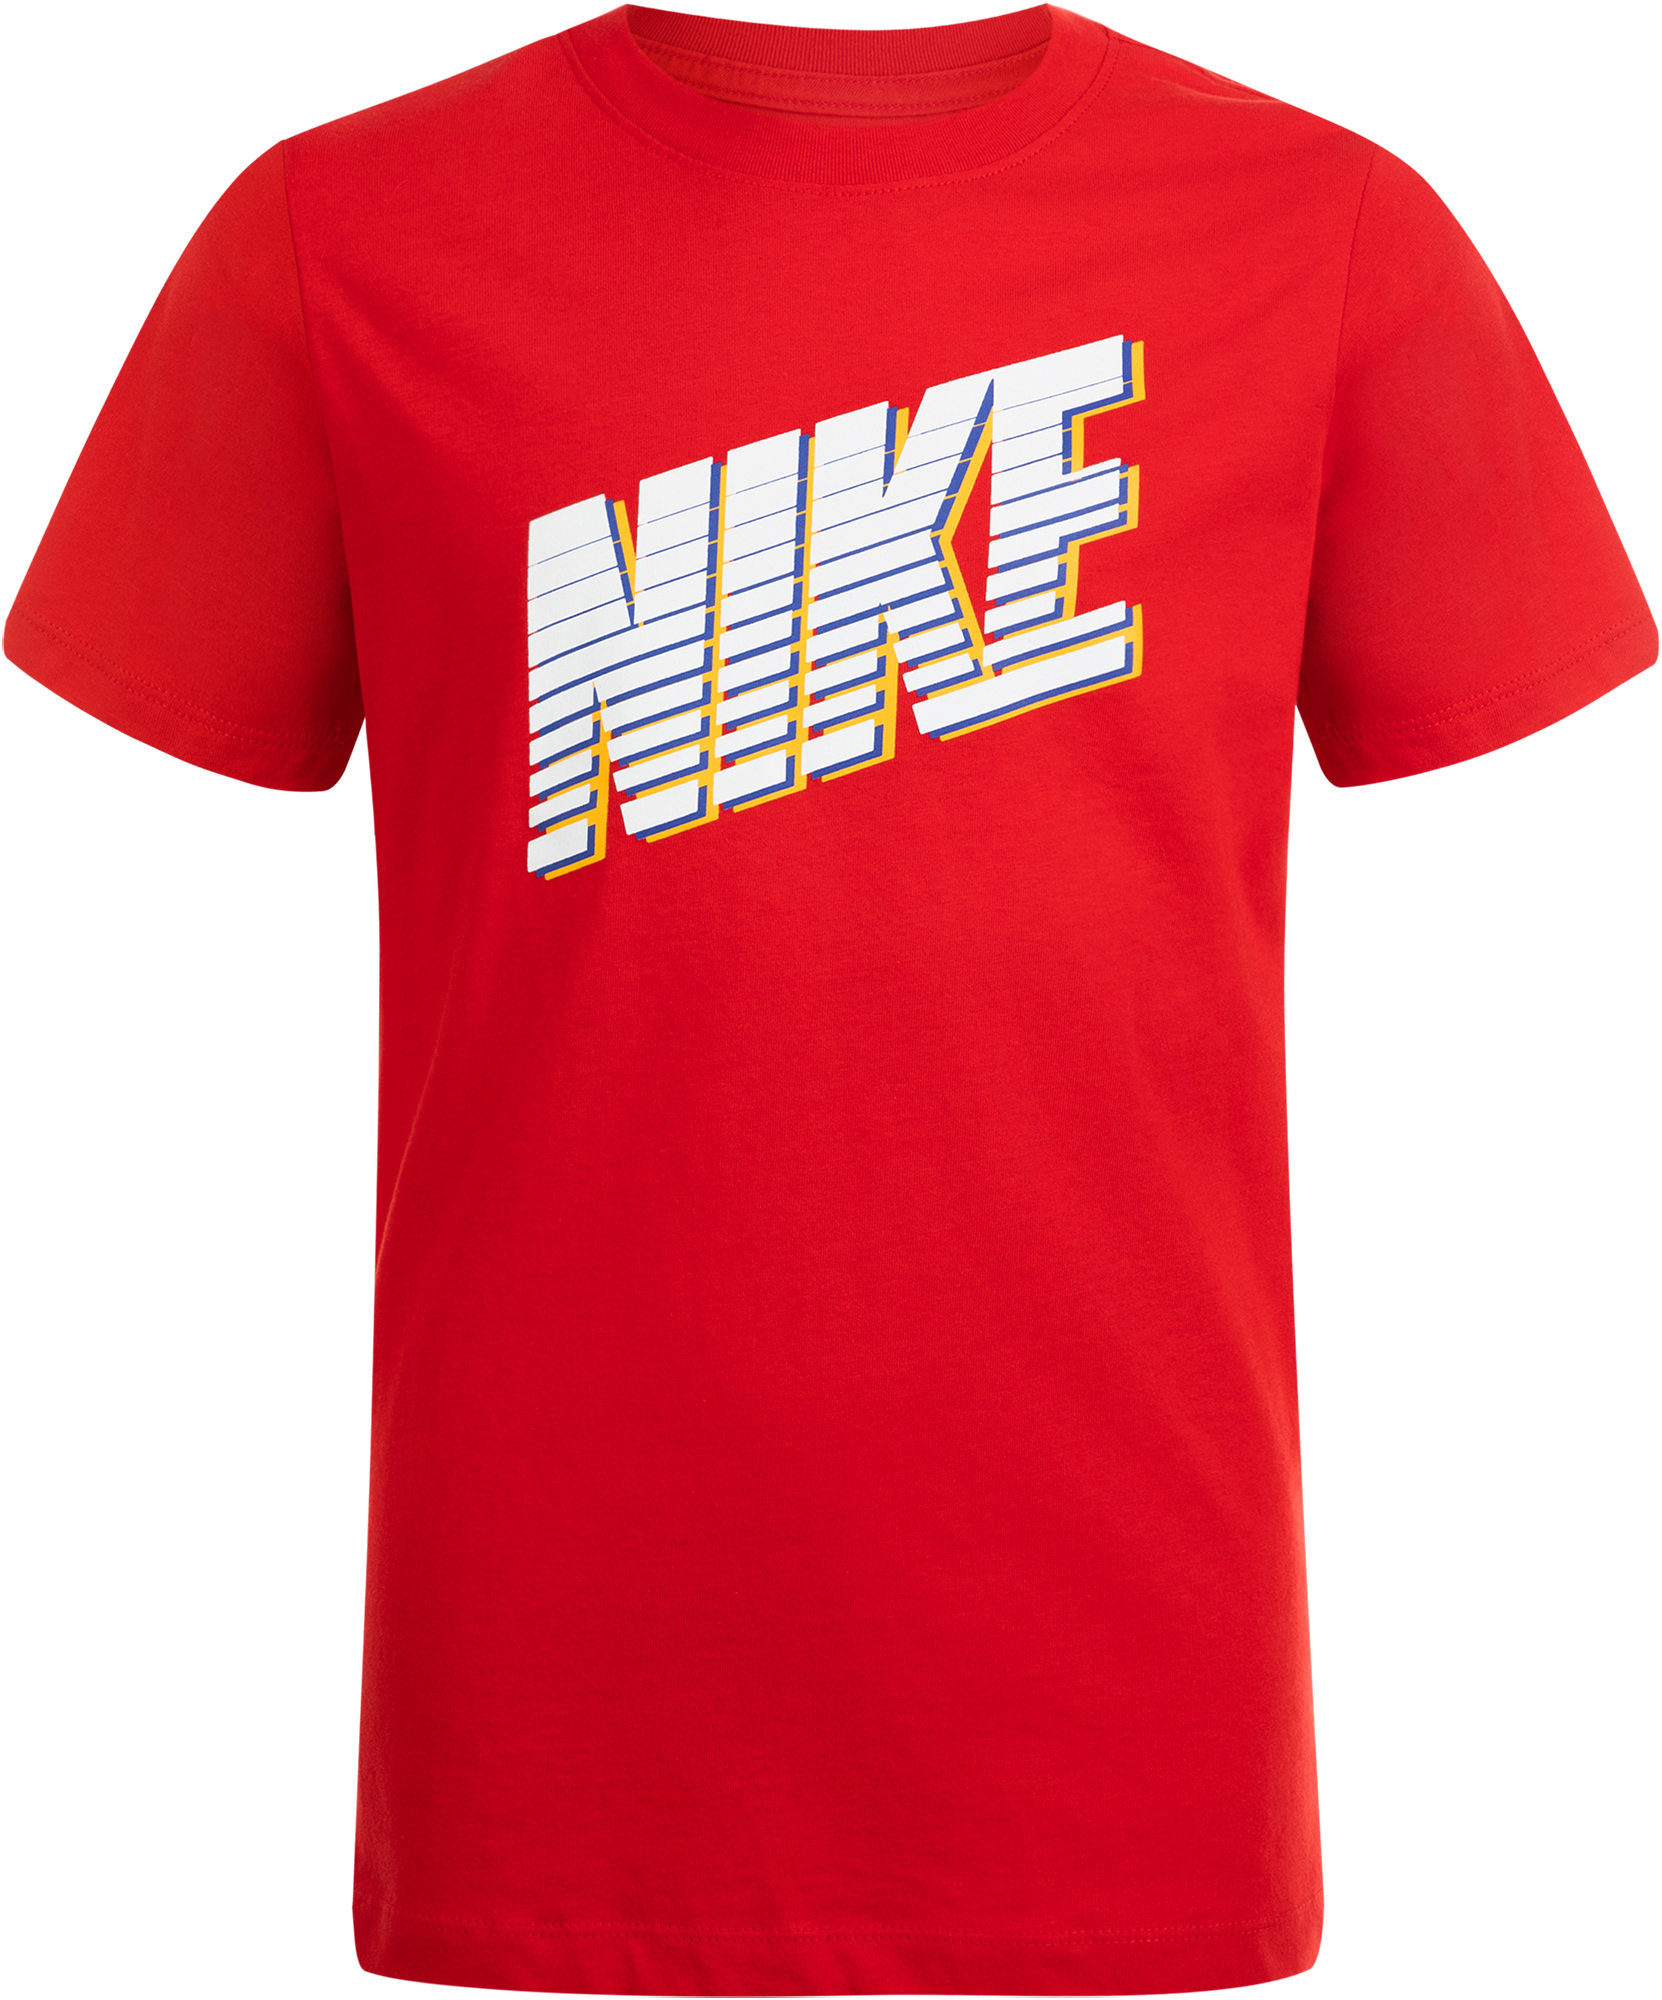 Nike Футболка для мальчиков Nike Sportswear, размер 147-158 nike футболка для мальчиков nike geo basketball